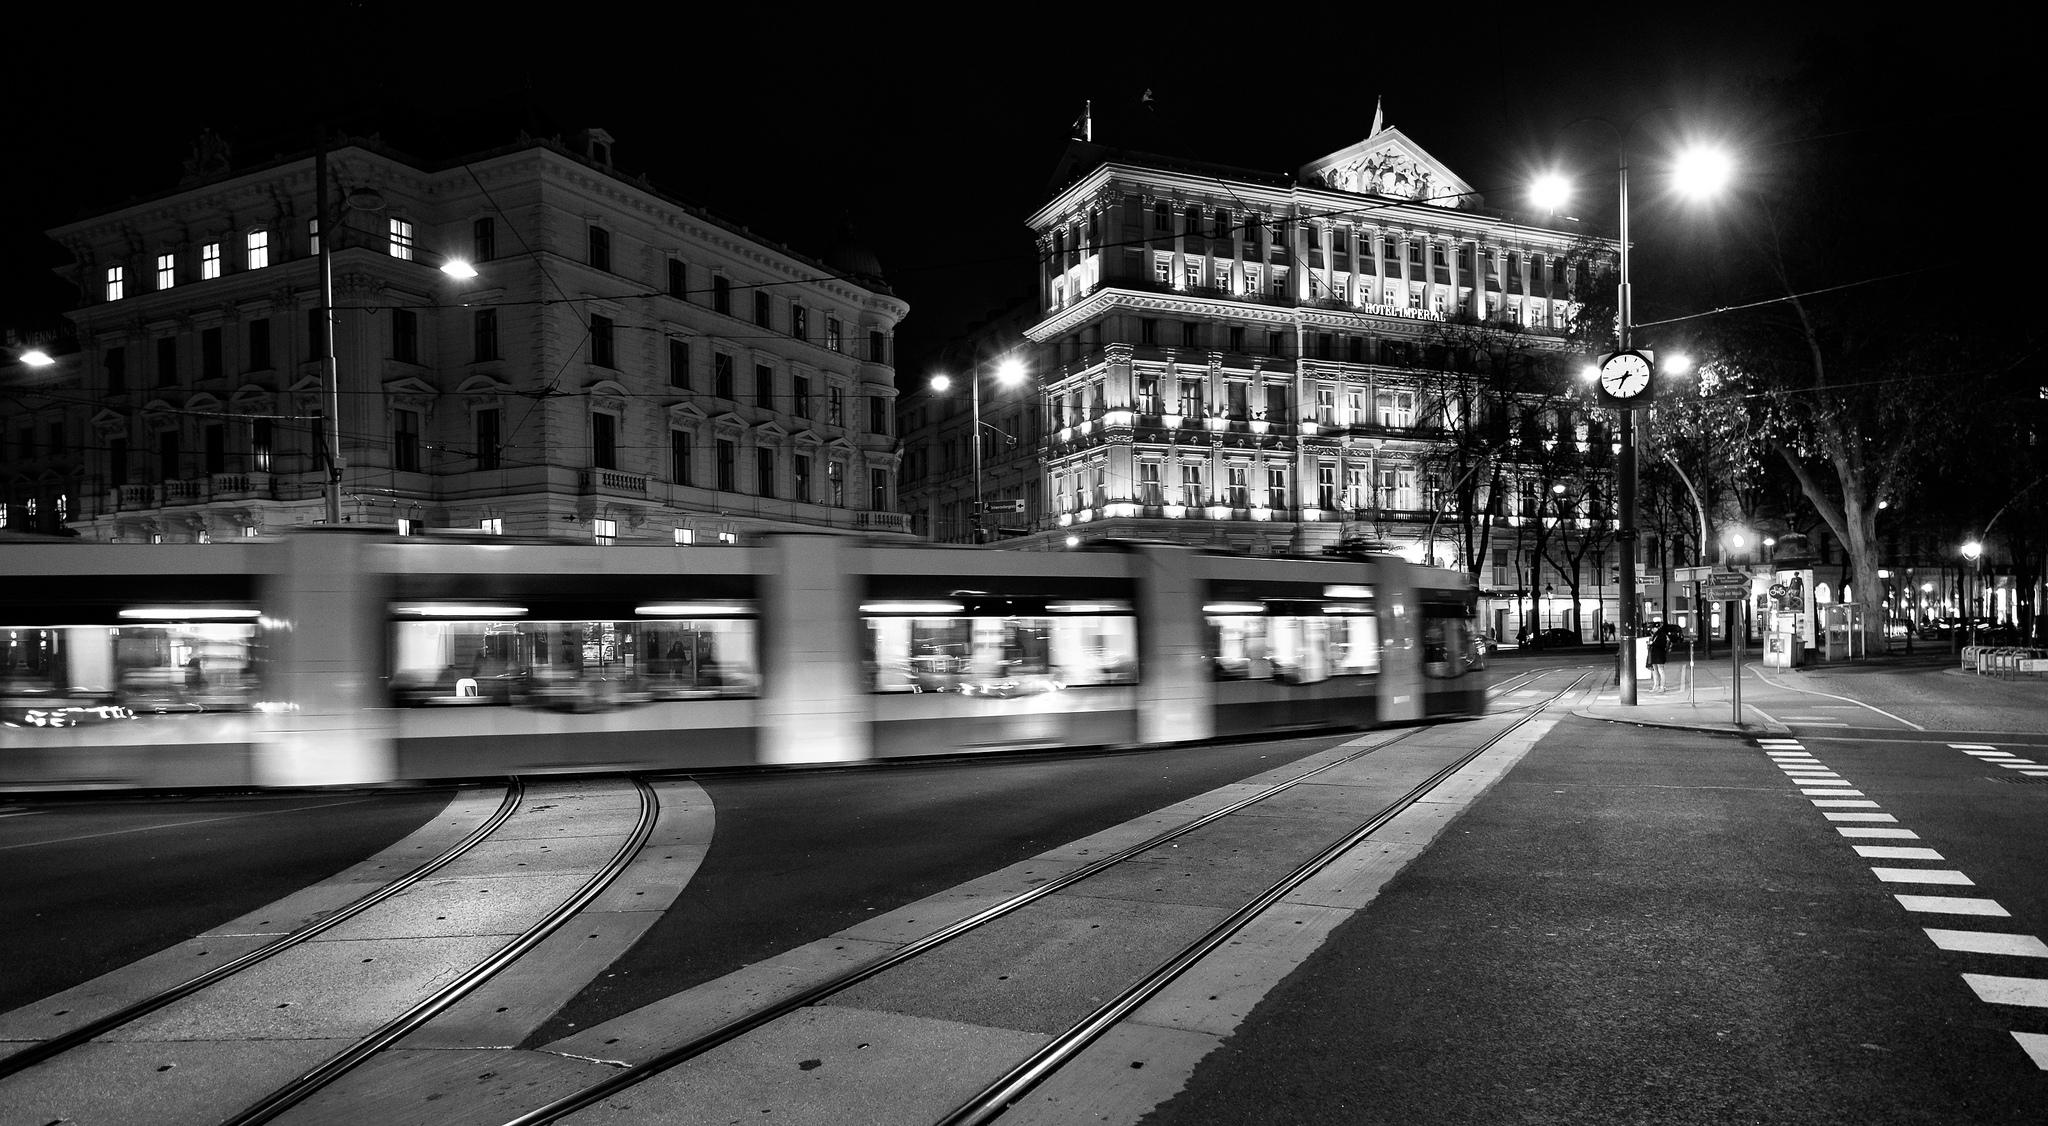 Traffic Viena by Roman Pfeiffer - Flickr